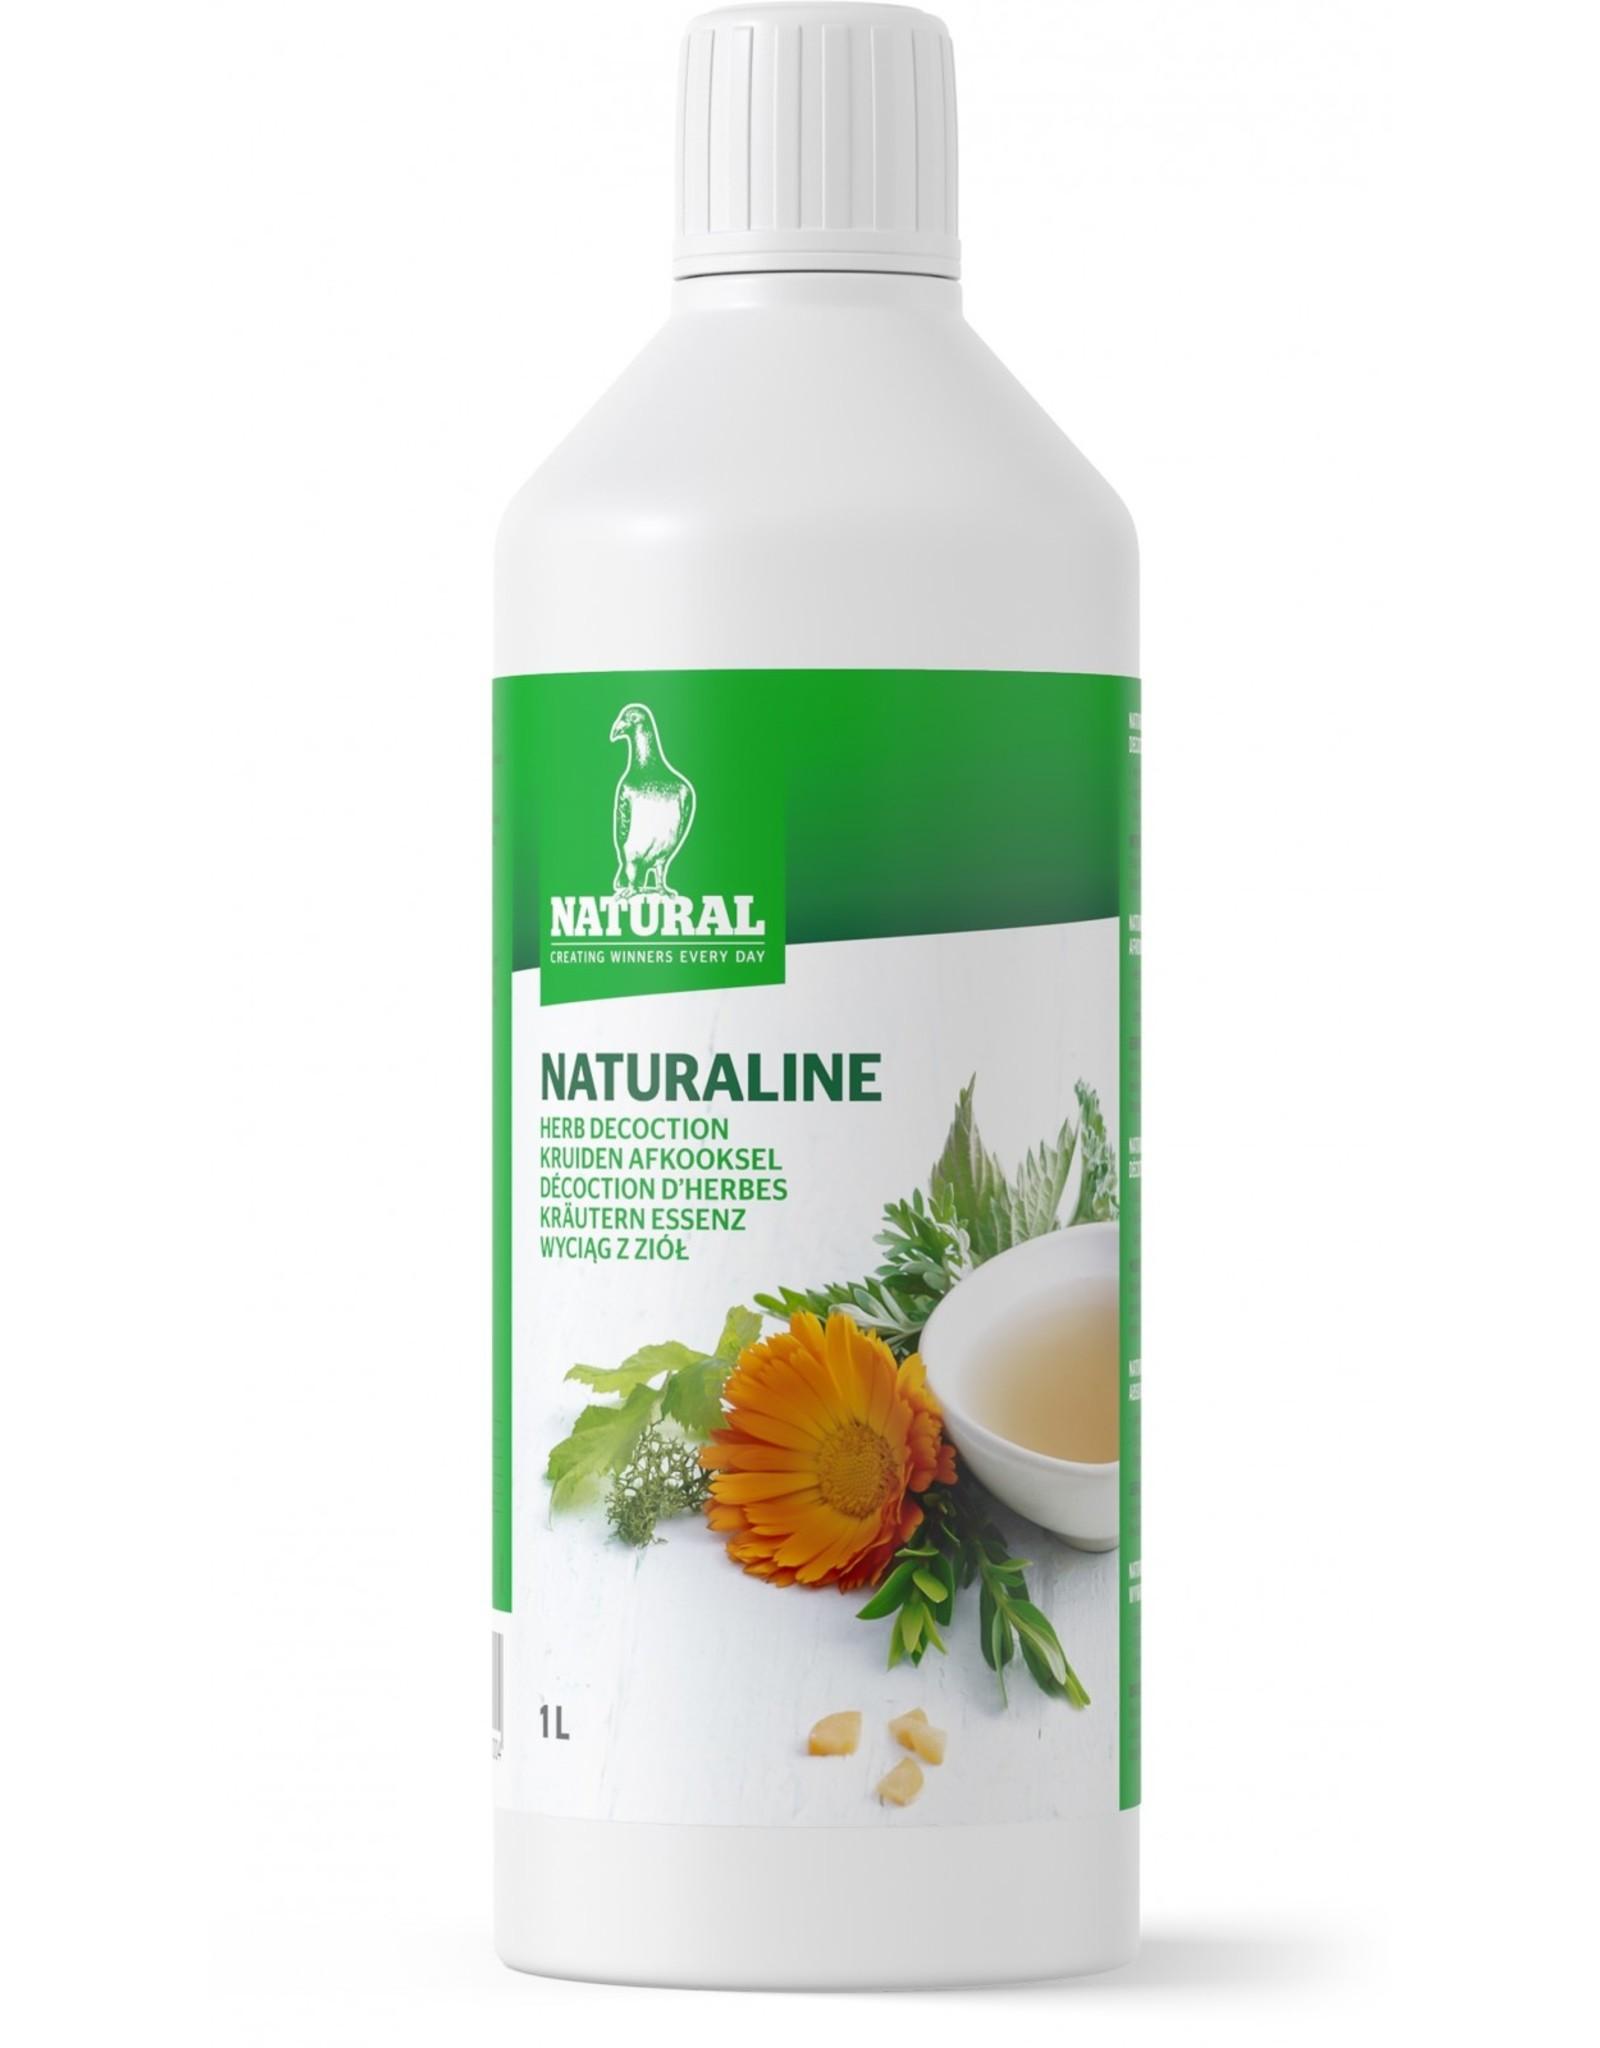 Natural Naturaline - 1000 ML